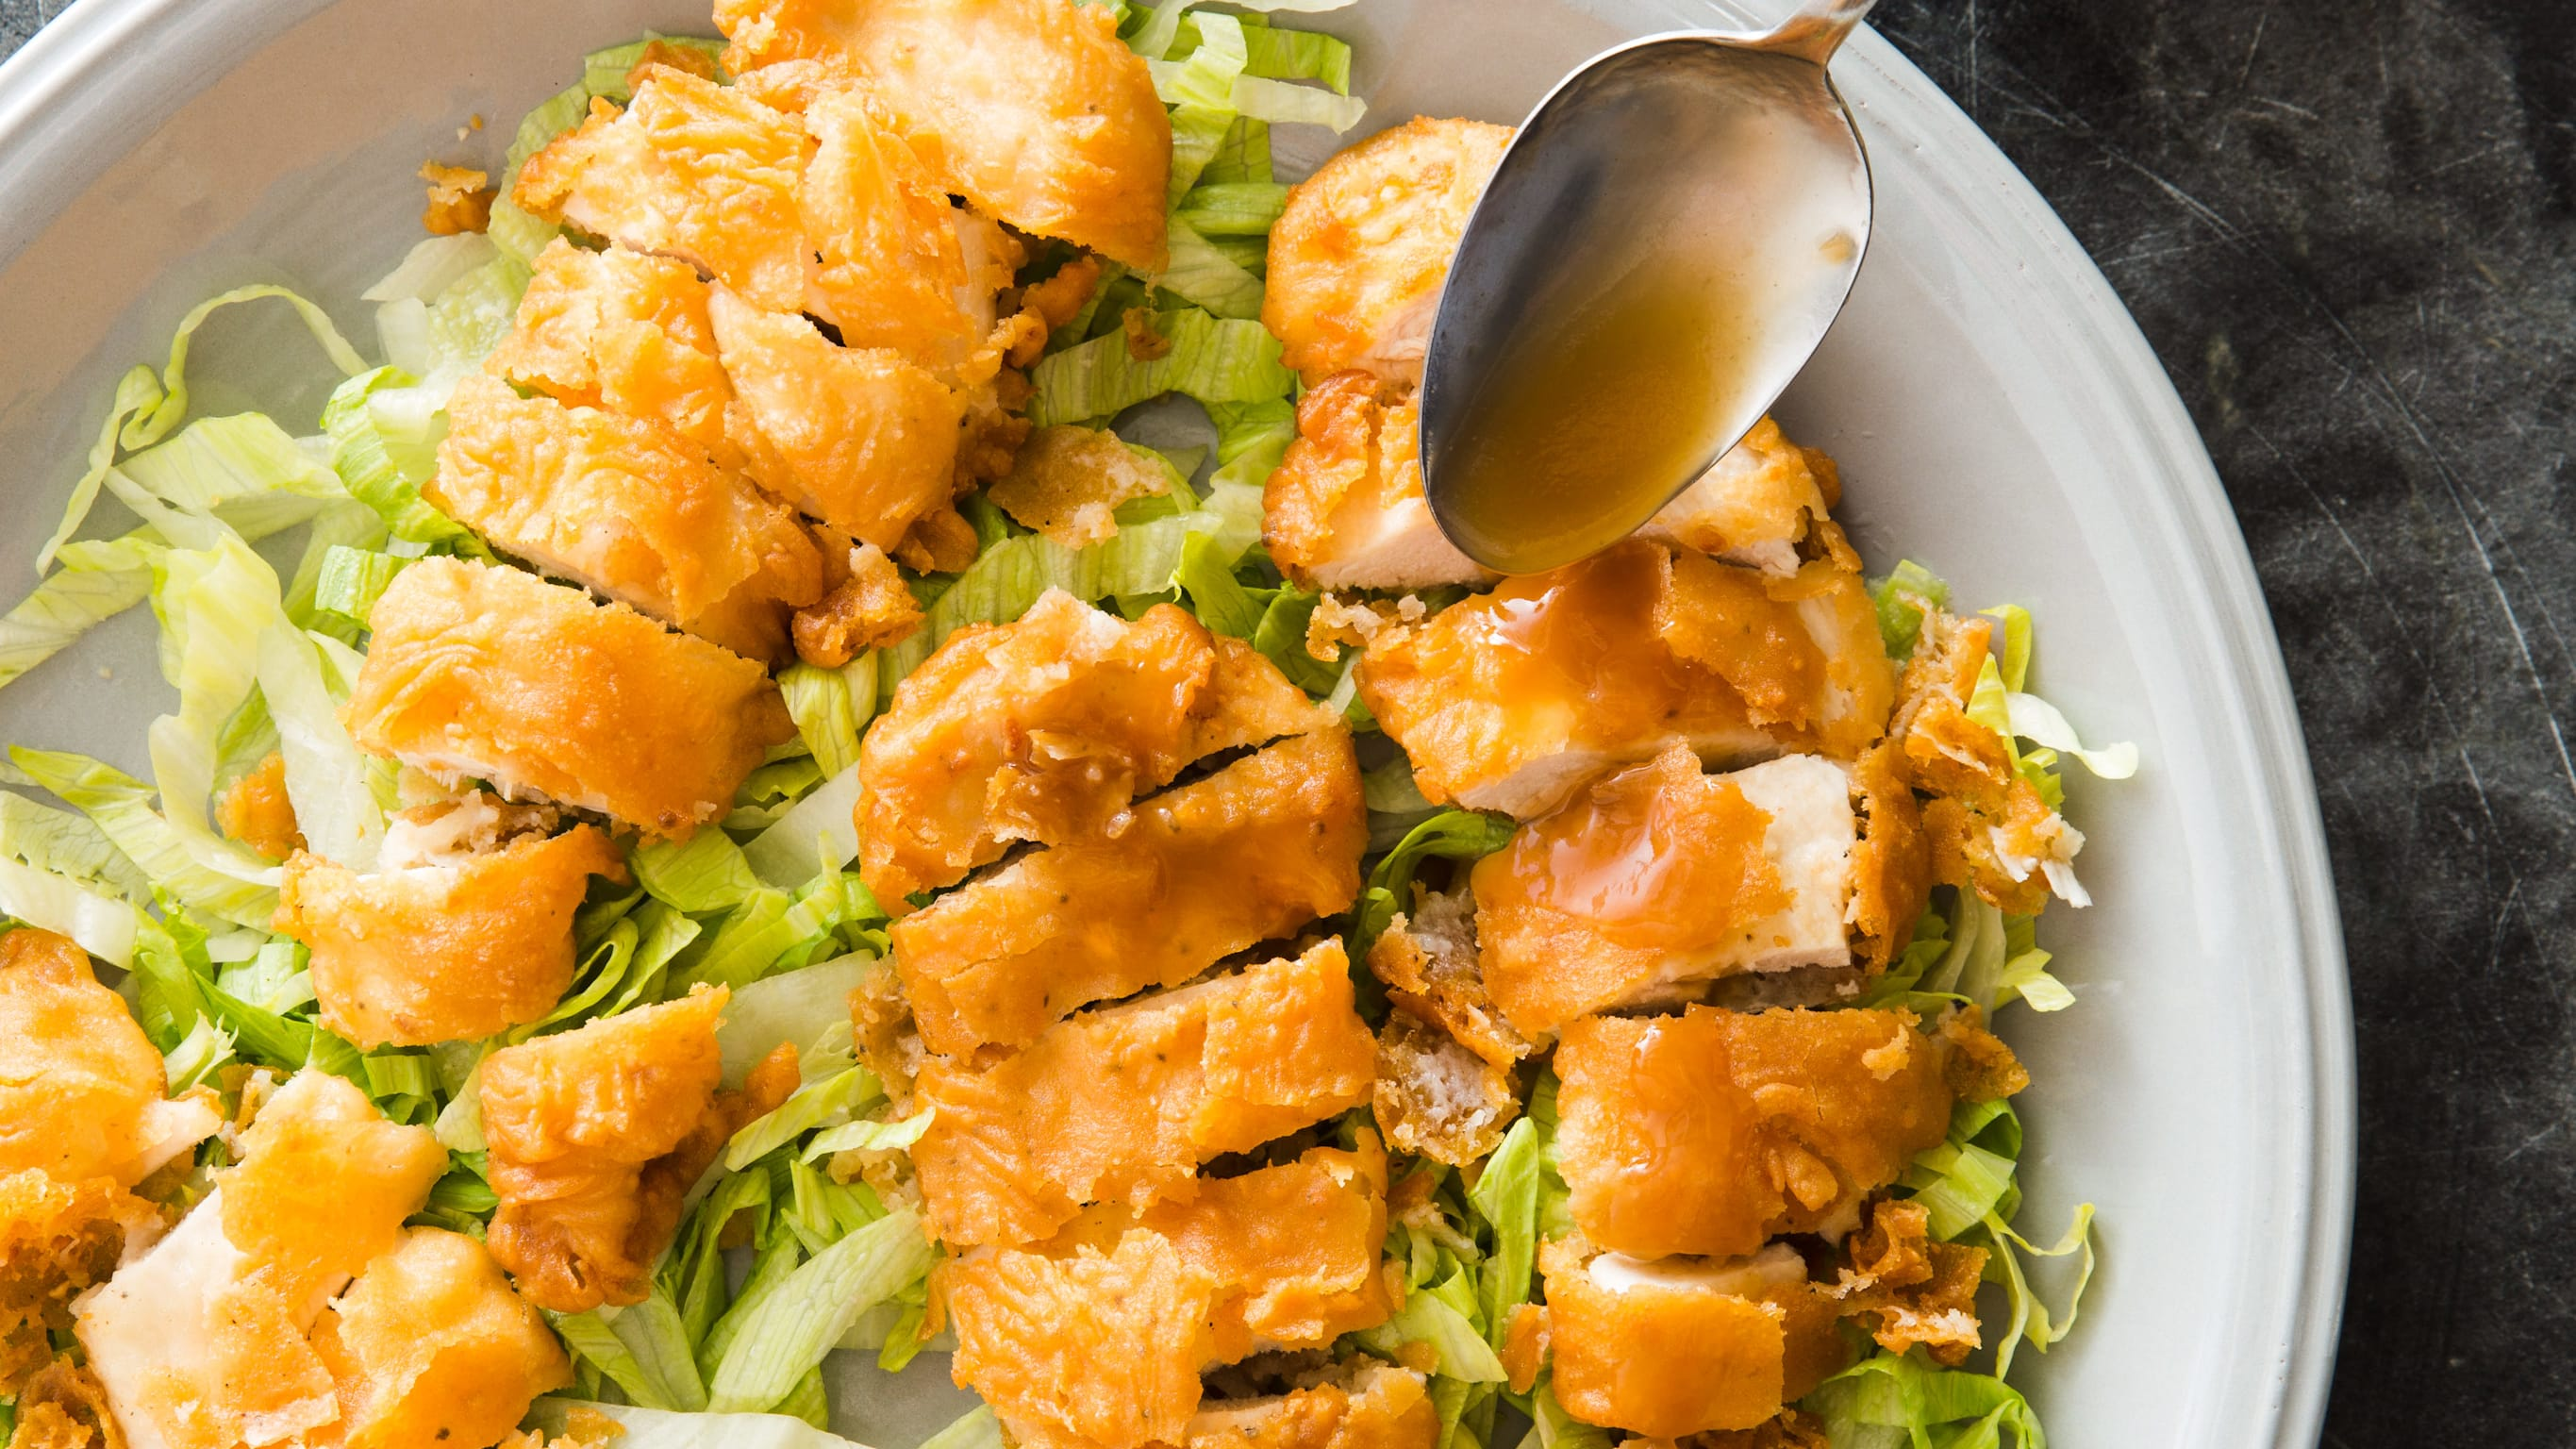 26503 sfs almond boneless chicken 13